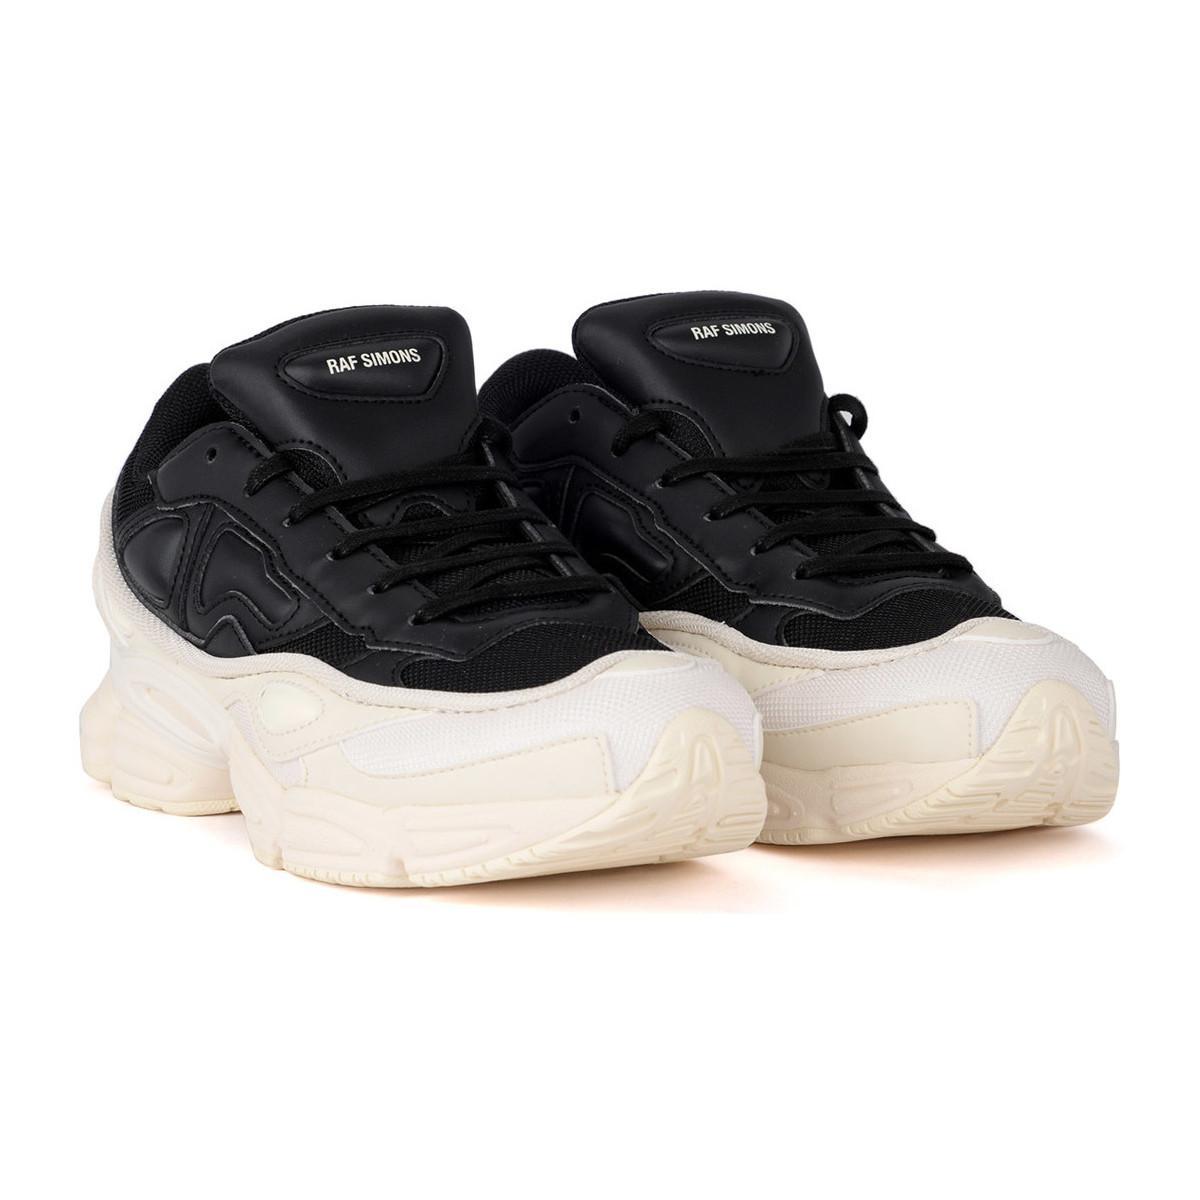 new arrival 7d651 7986b scarpe adidas originals superstar up donna gold metallic nero bianca m19507   view fullscreen